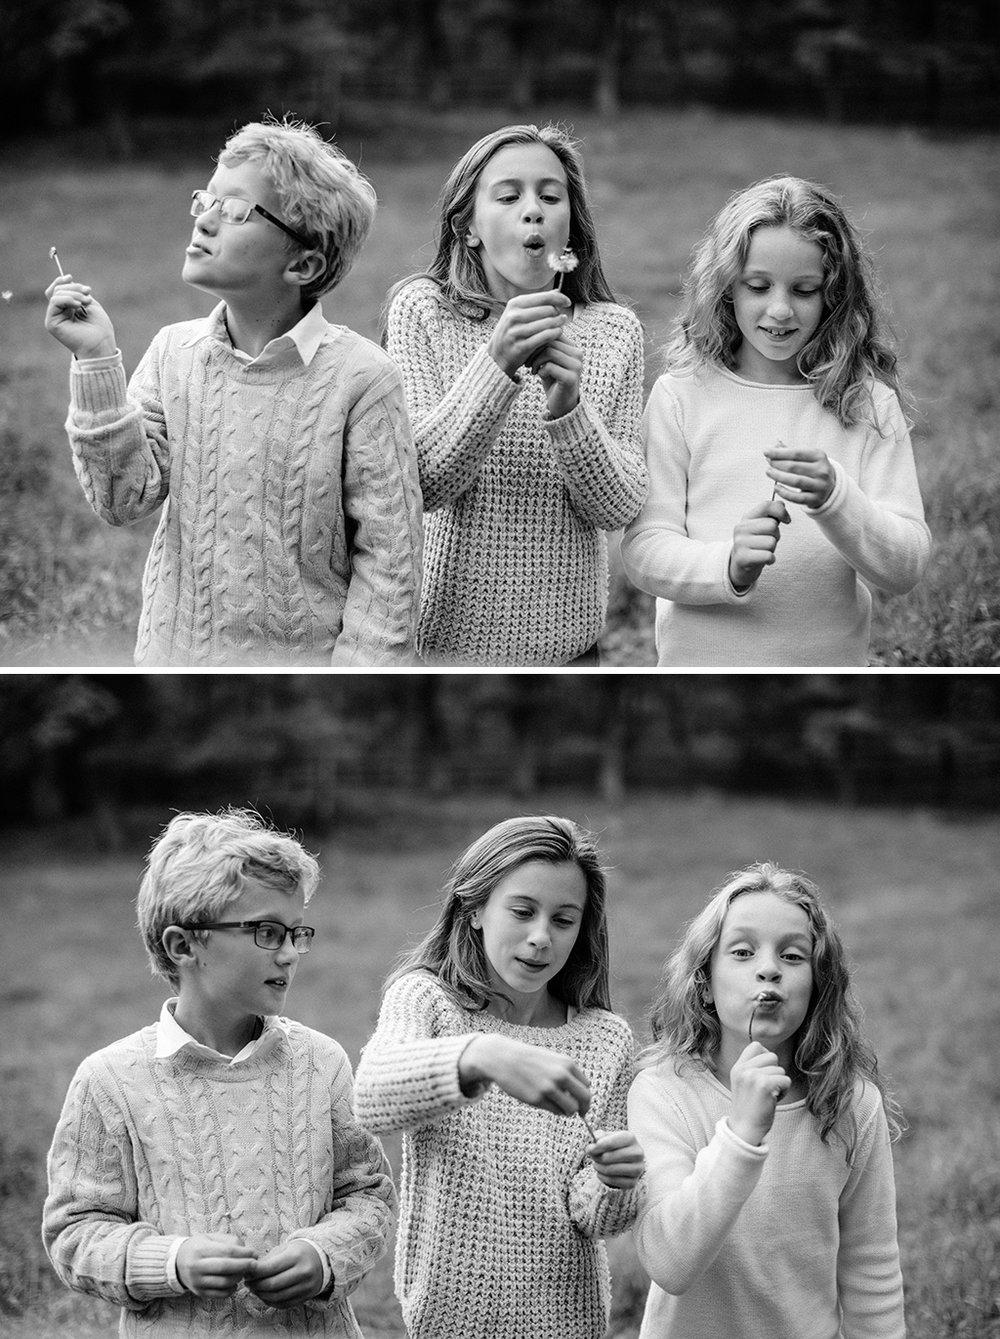 Familjefotografering_i-Stockholm_Lifestyle-familjefotograf-Anna-Sandstrom_19.jpg